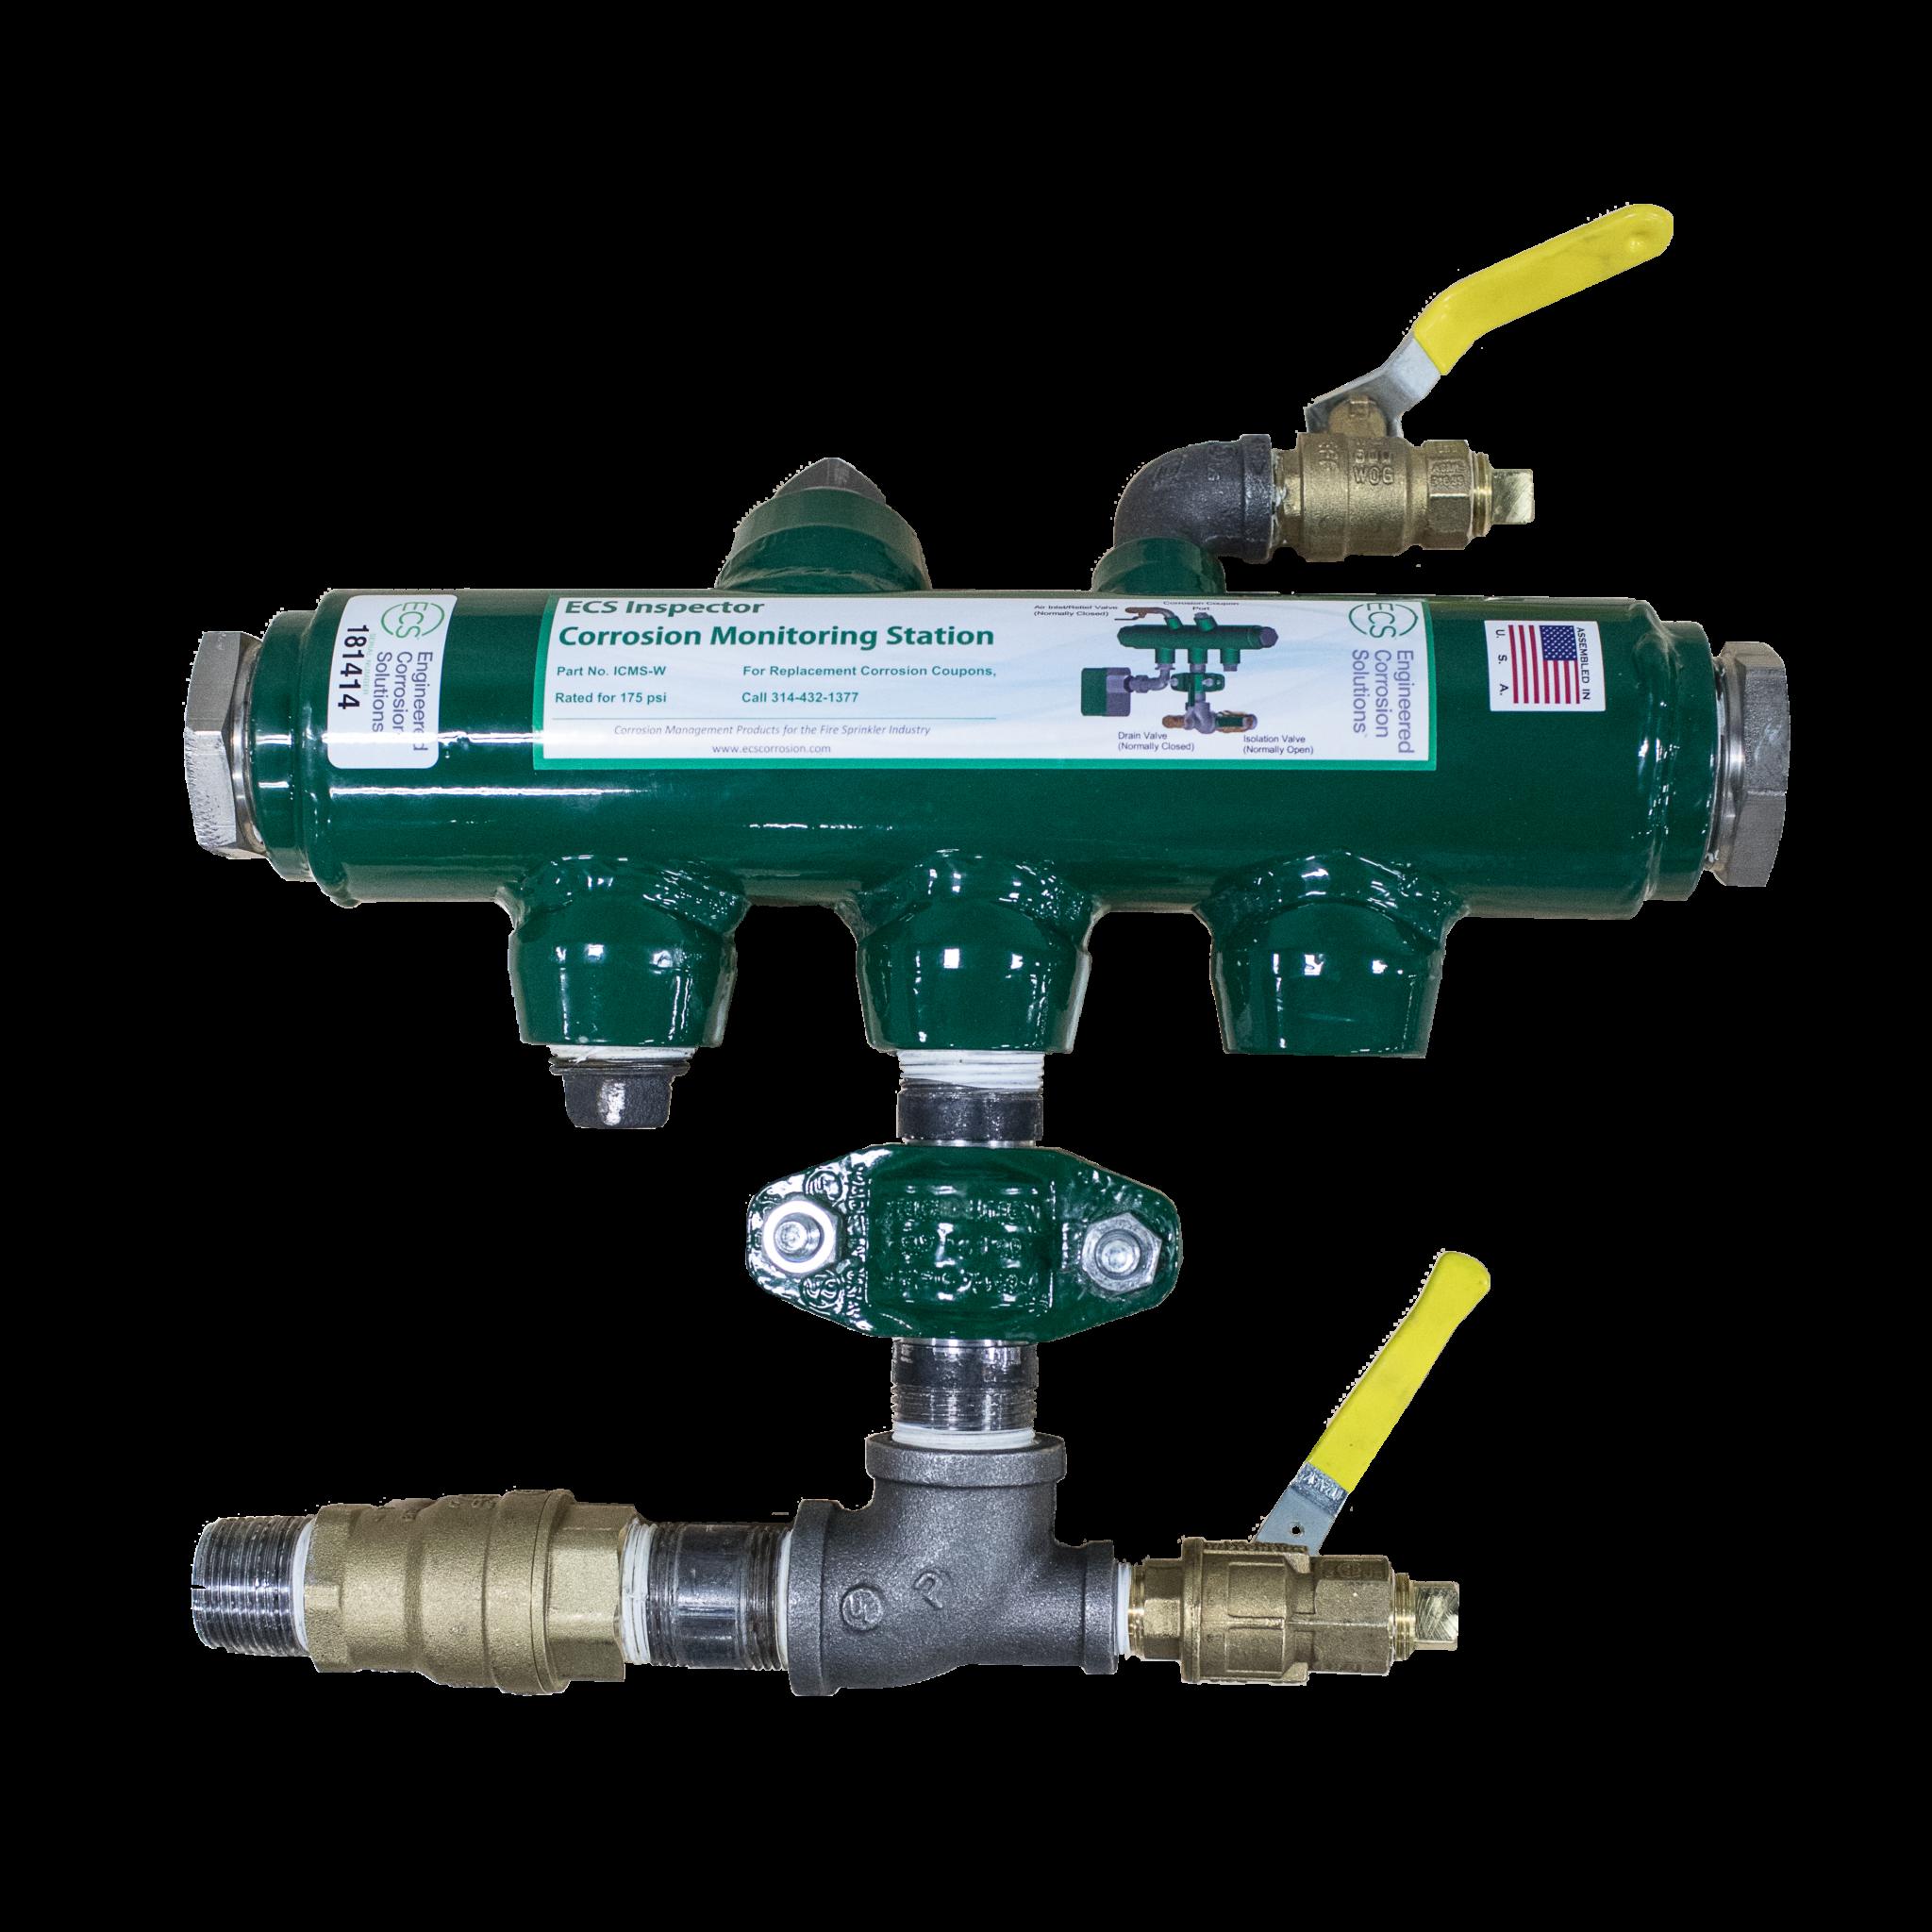 Inspector Monitoring Station and Sprinkler System Maintenance